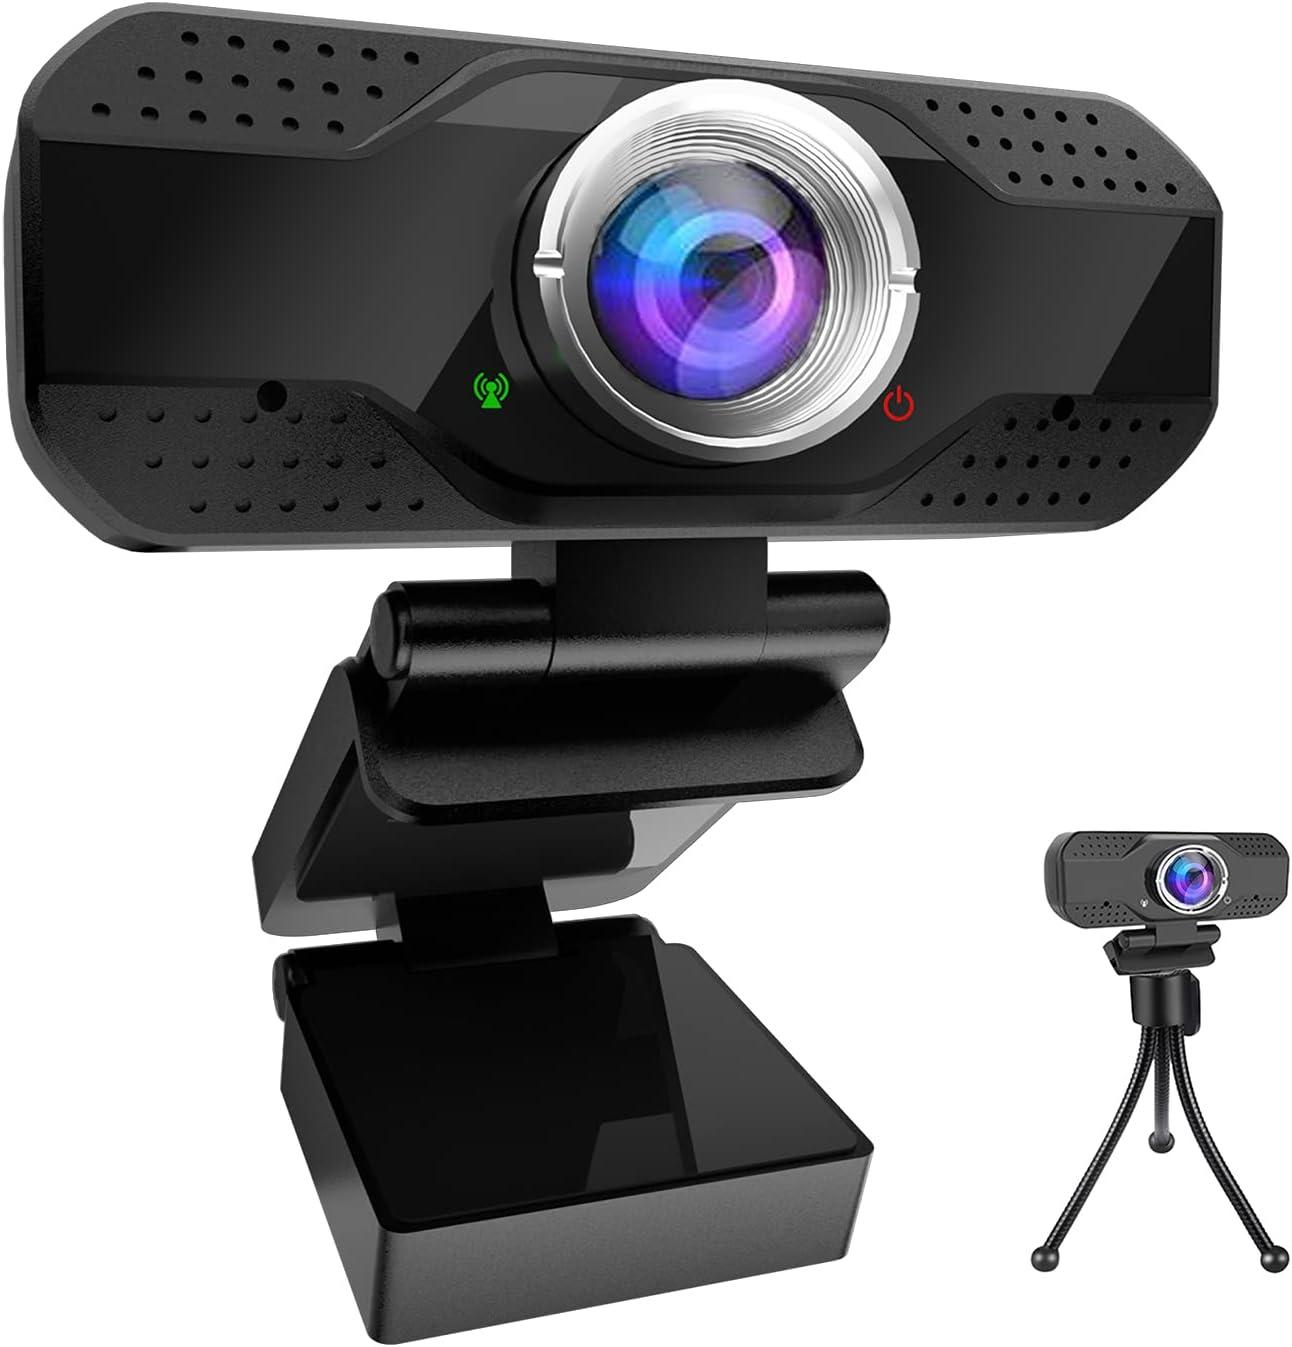 Alcyoneus 1080p HD Webcam $8.39 Coupon